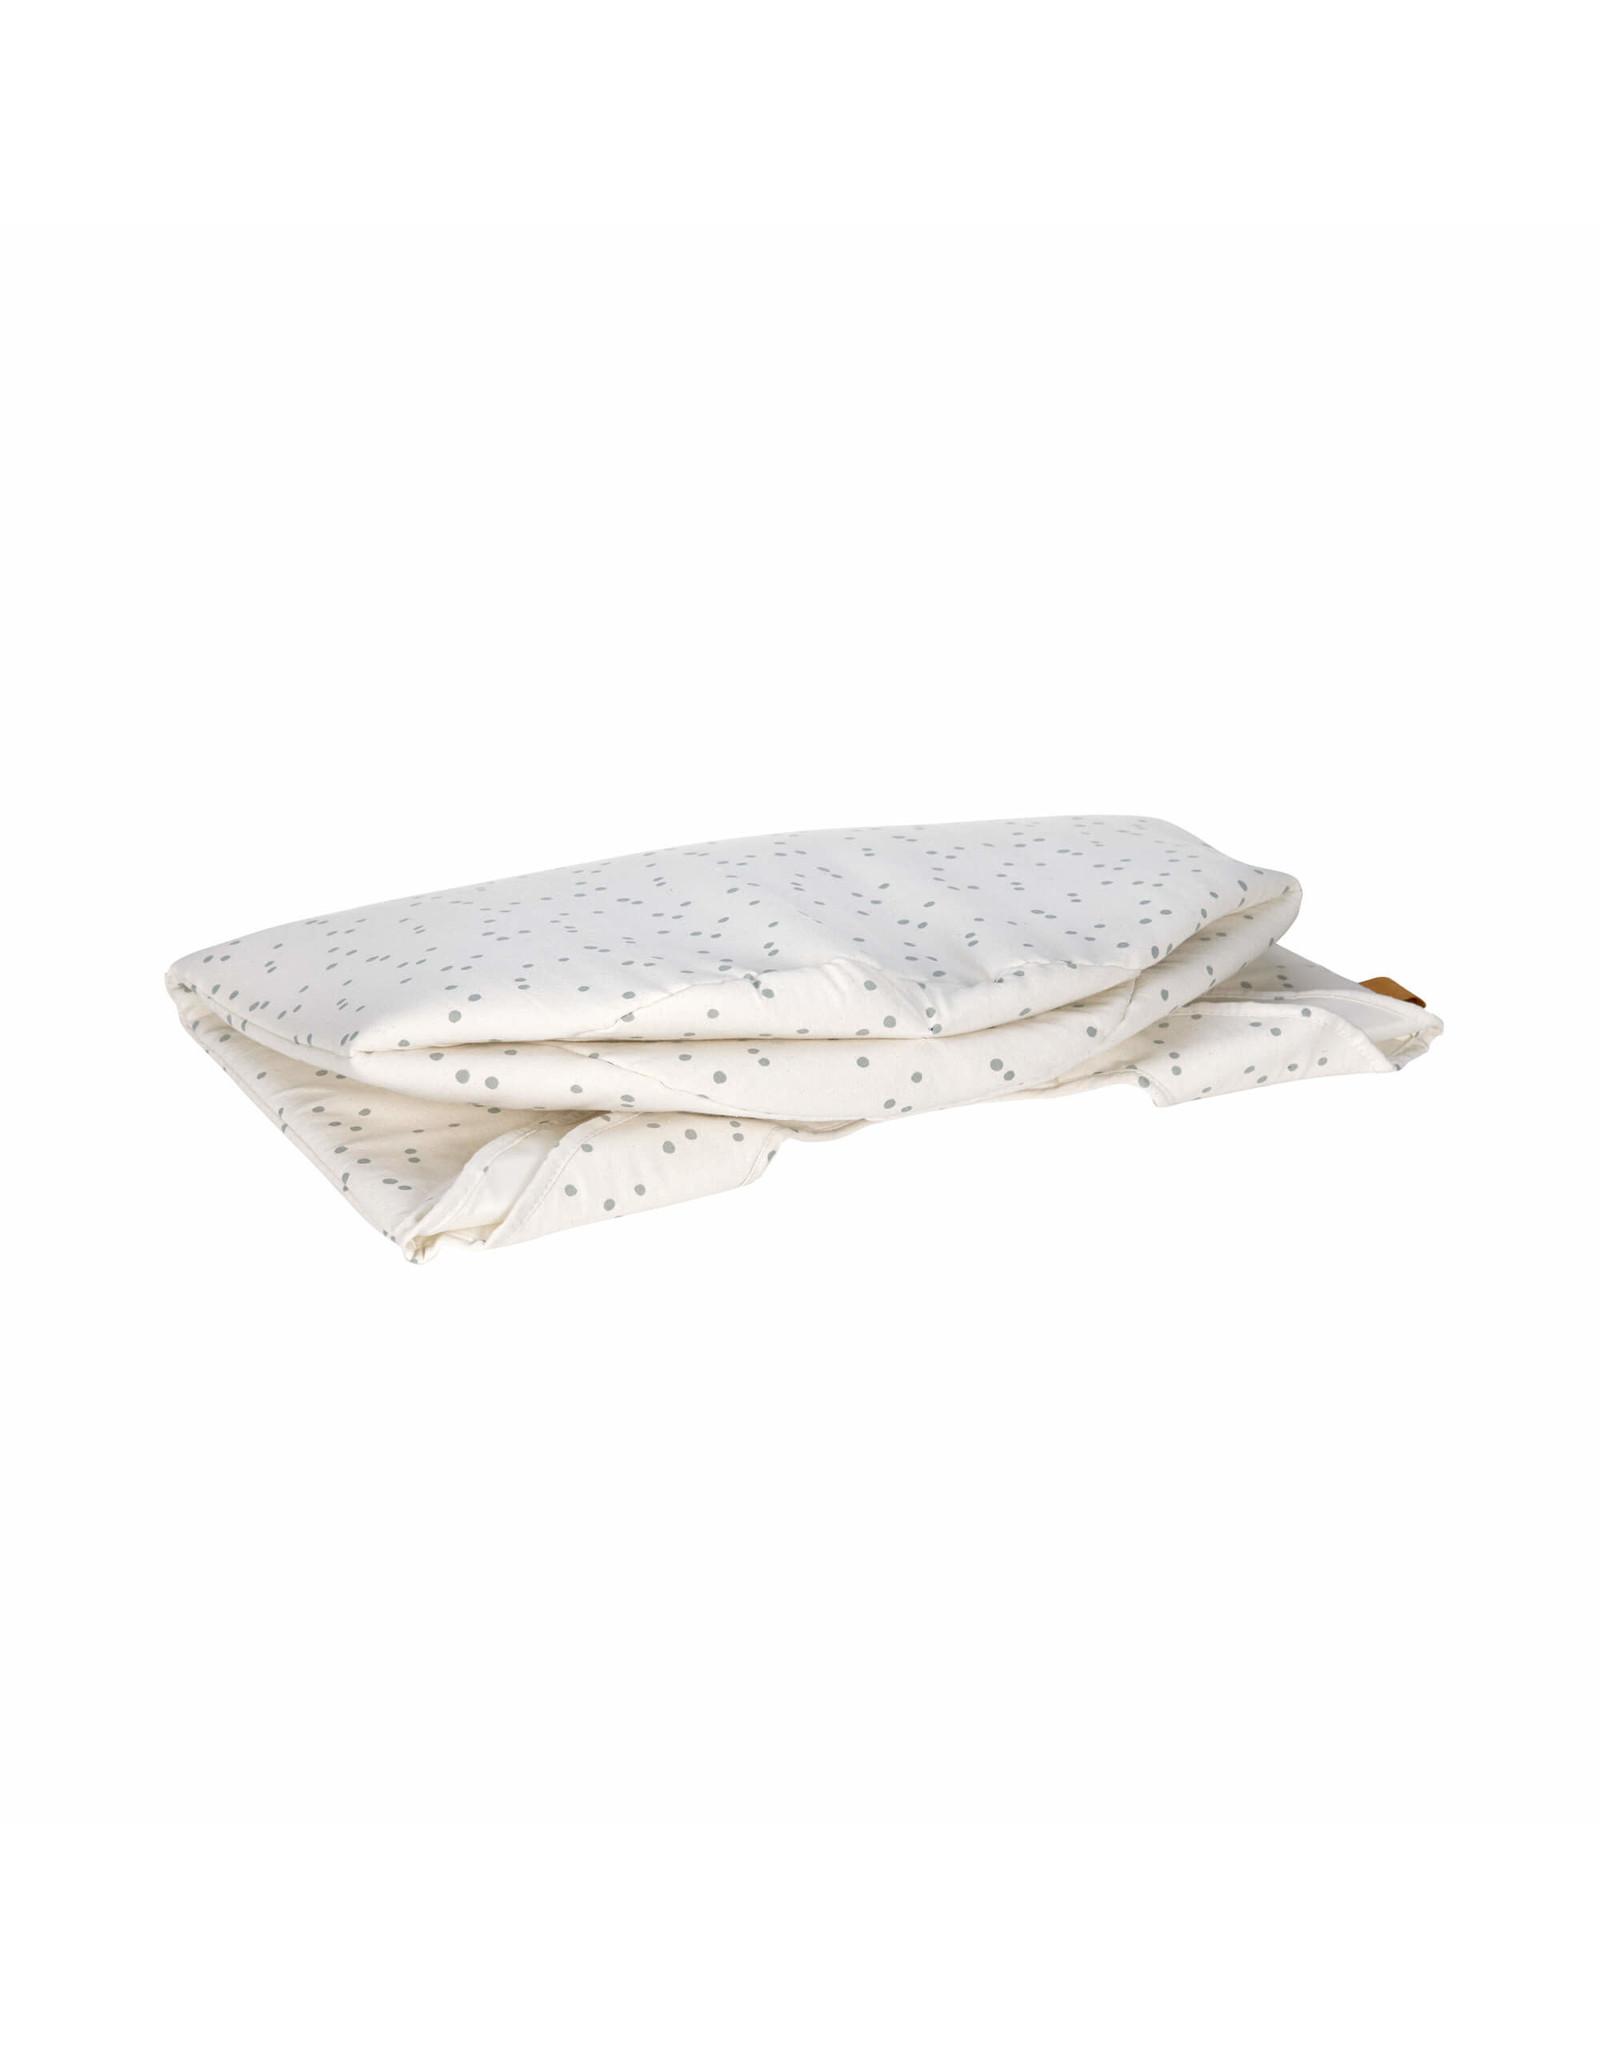 Lassig Lassig Laundry Bag Allover Speckles